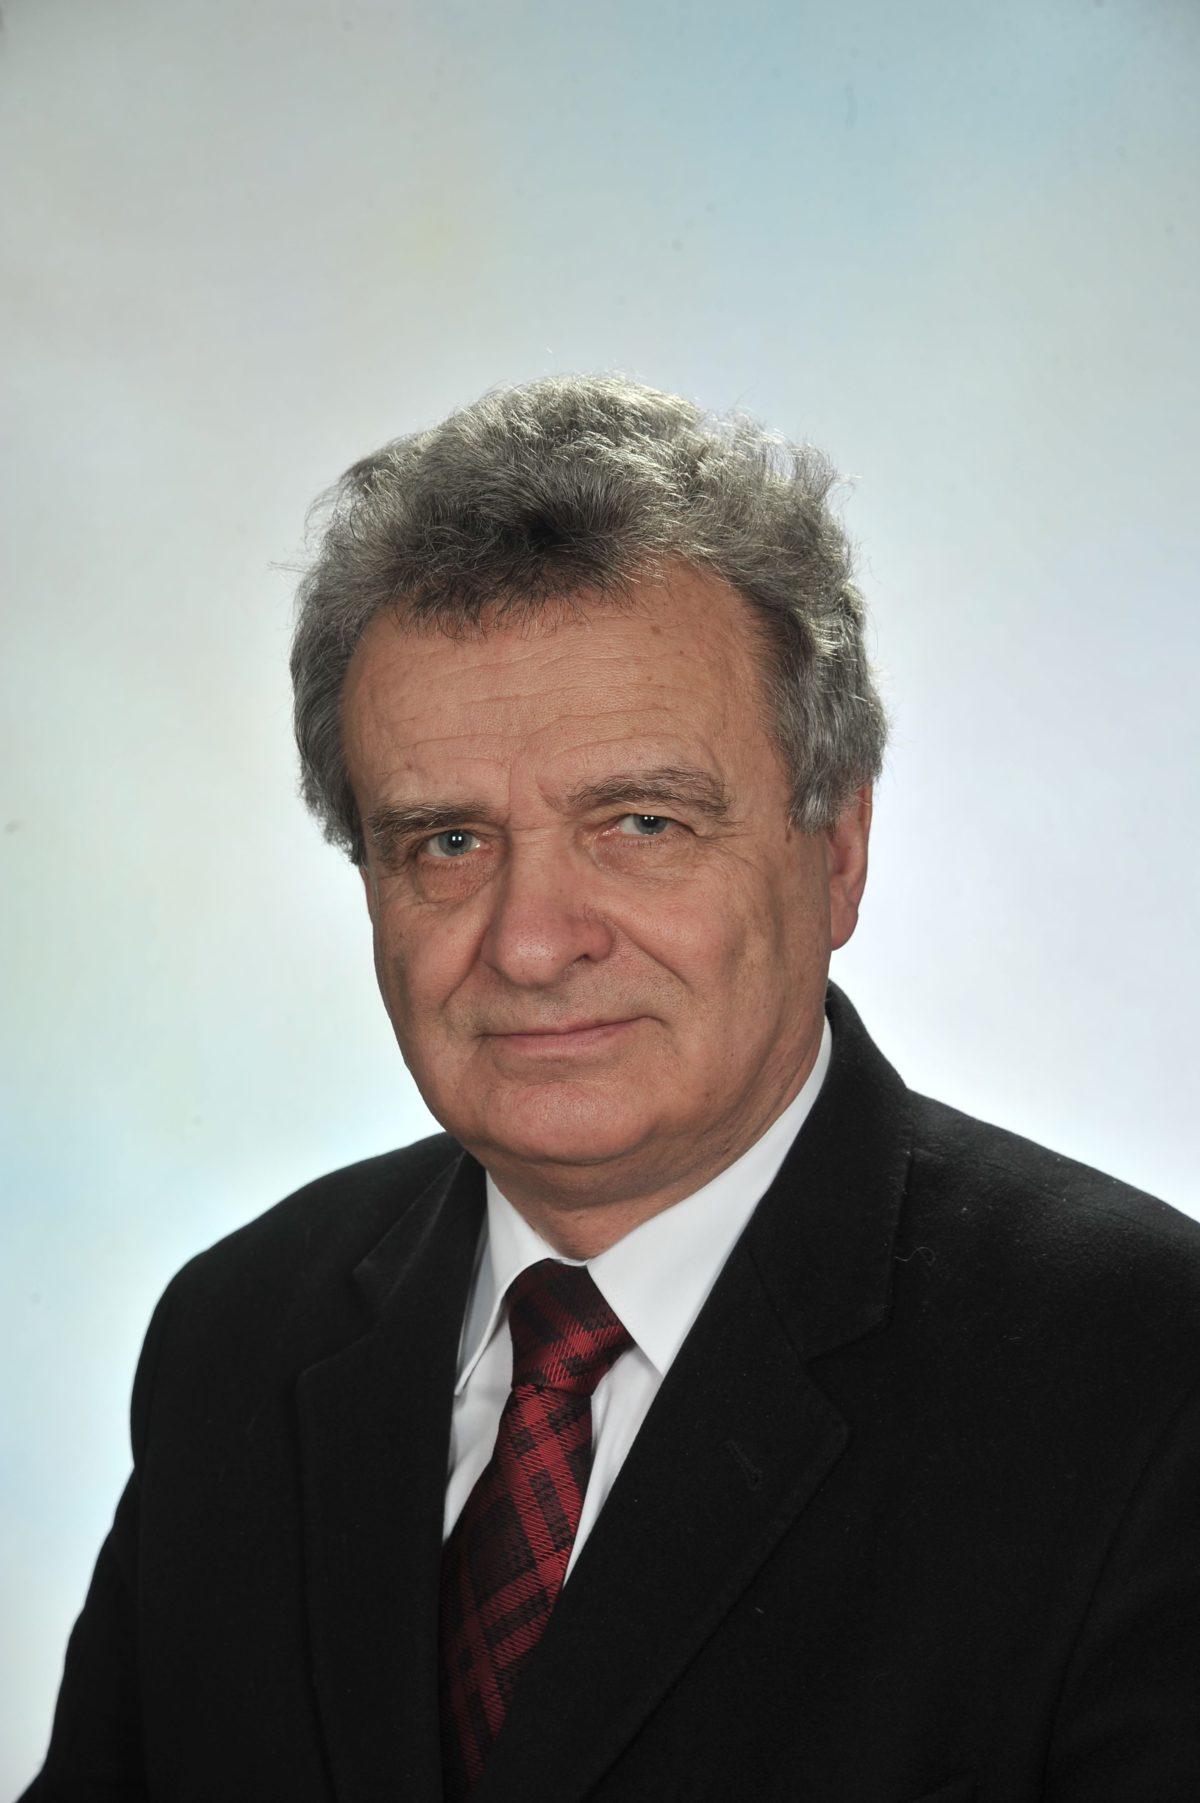 Henryk Ławniczek